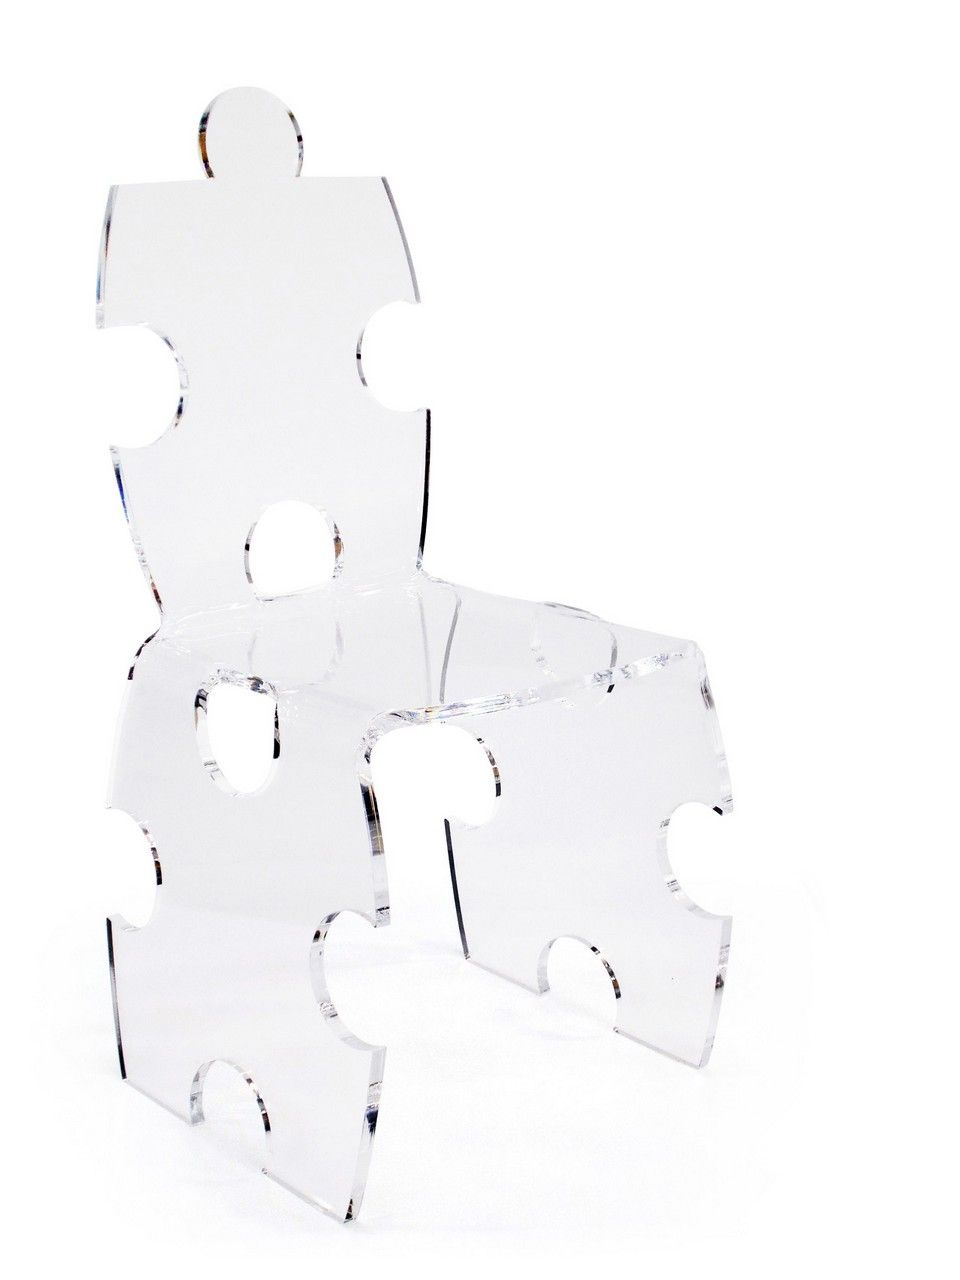 Chaise Acrylique Acrylique Chaise Puzzle Puzzle Transparent On0wPX8k